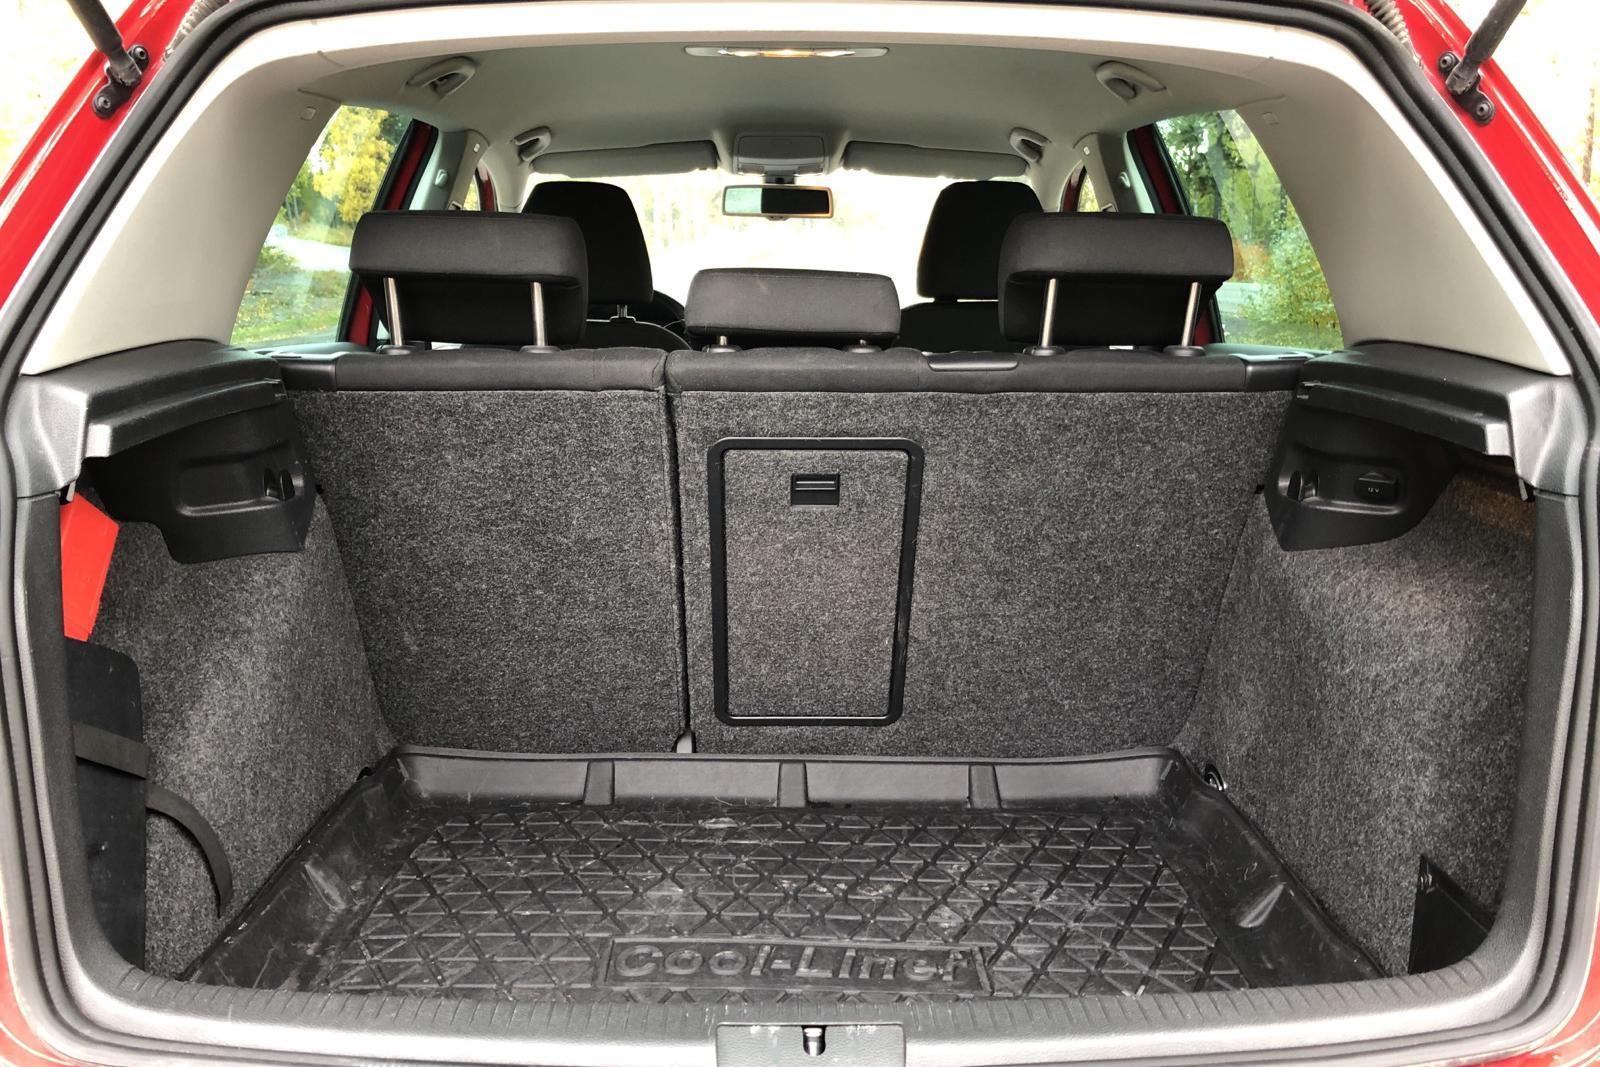 VW Golf VI GT 1.4 TSI 5dr (160hk) - 102 000 km - Manual - red - 2009